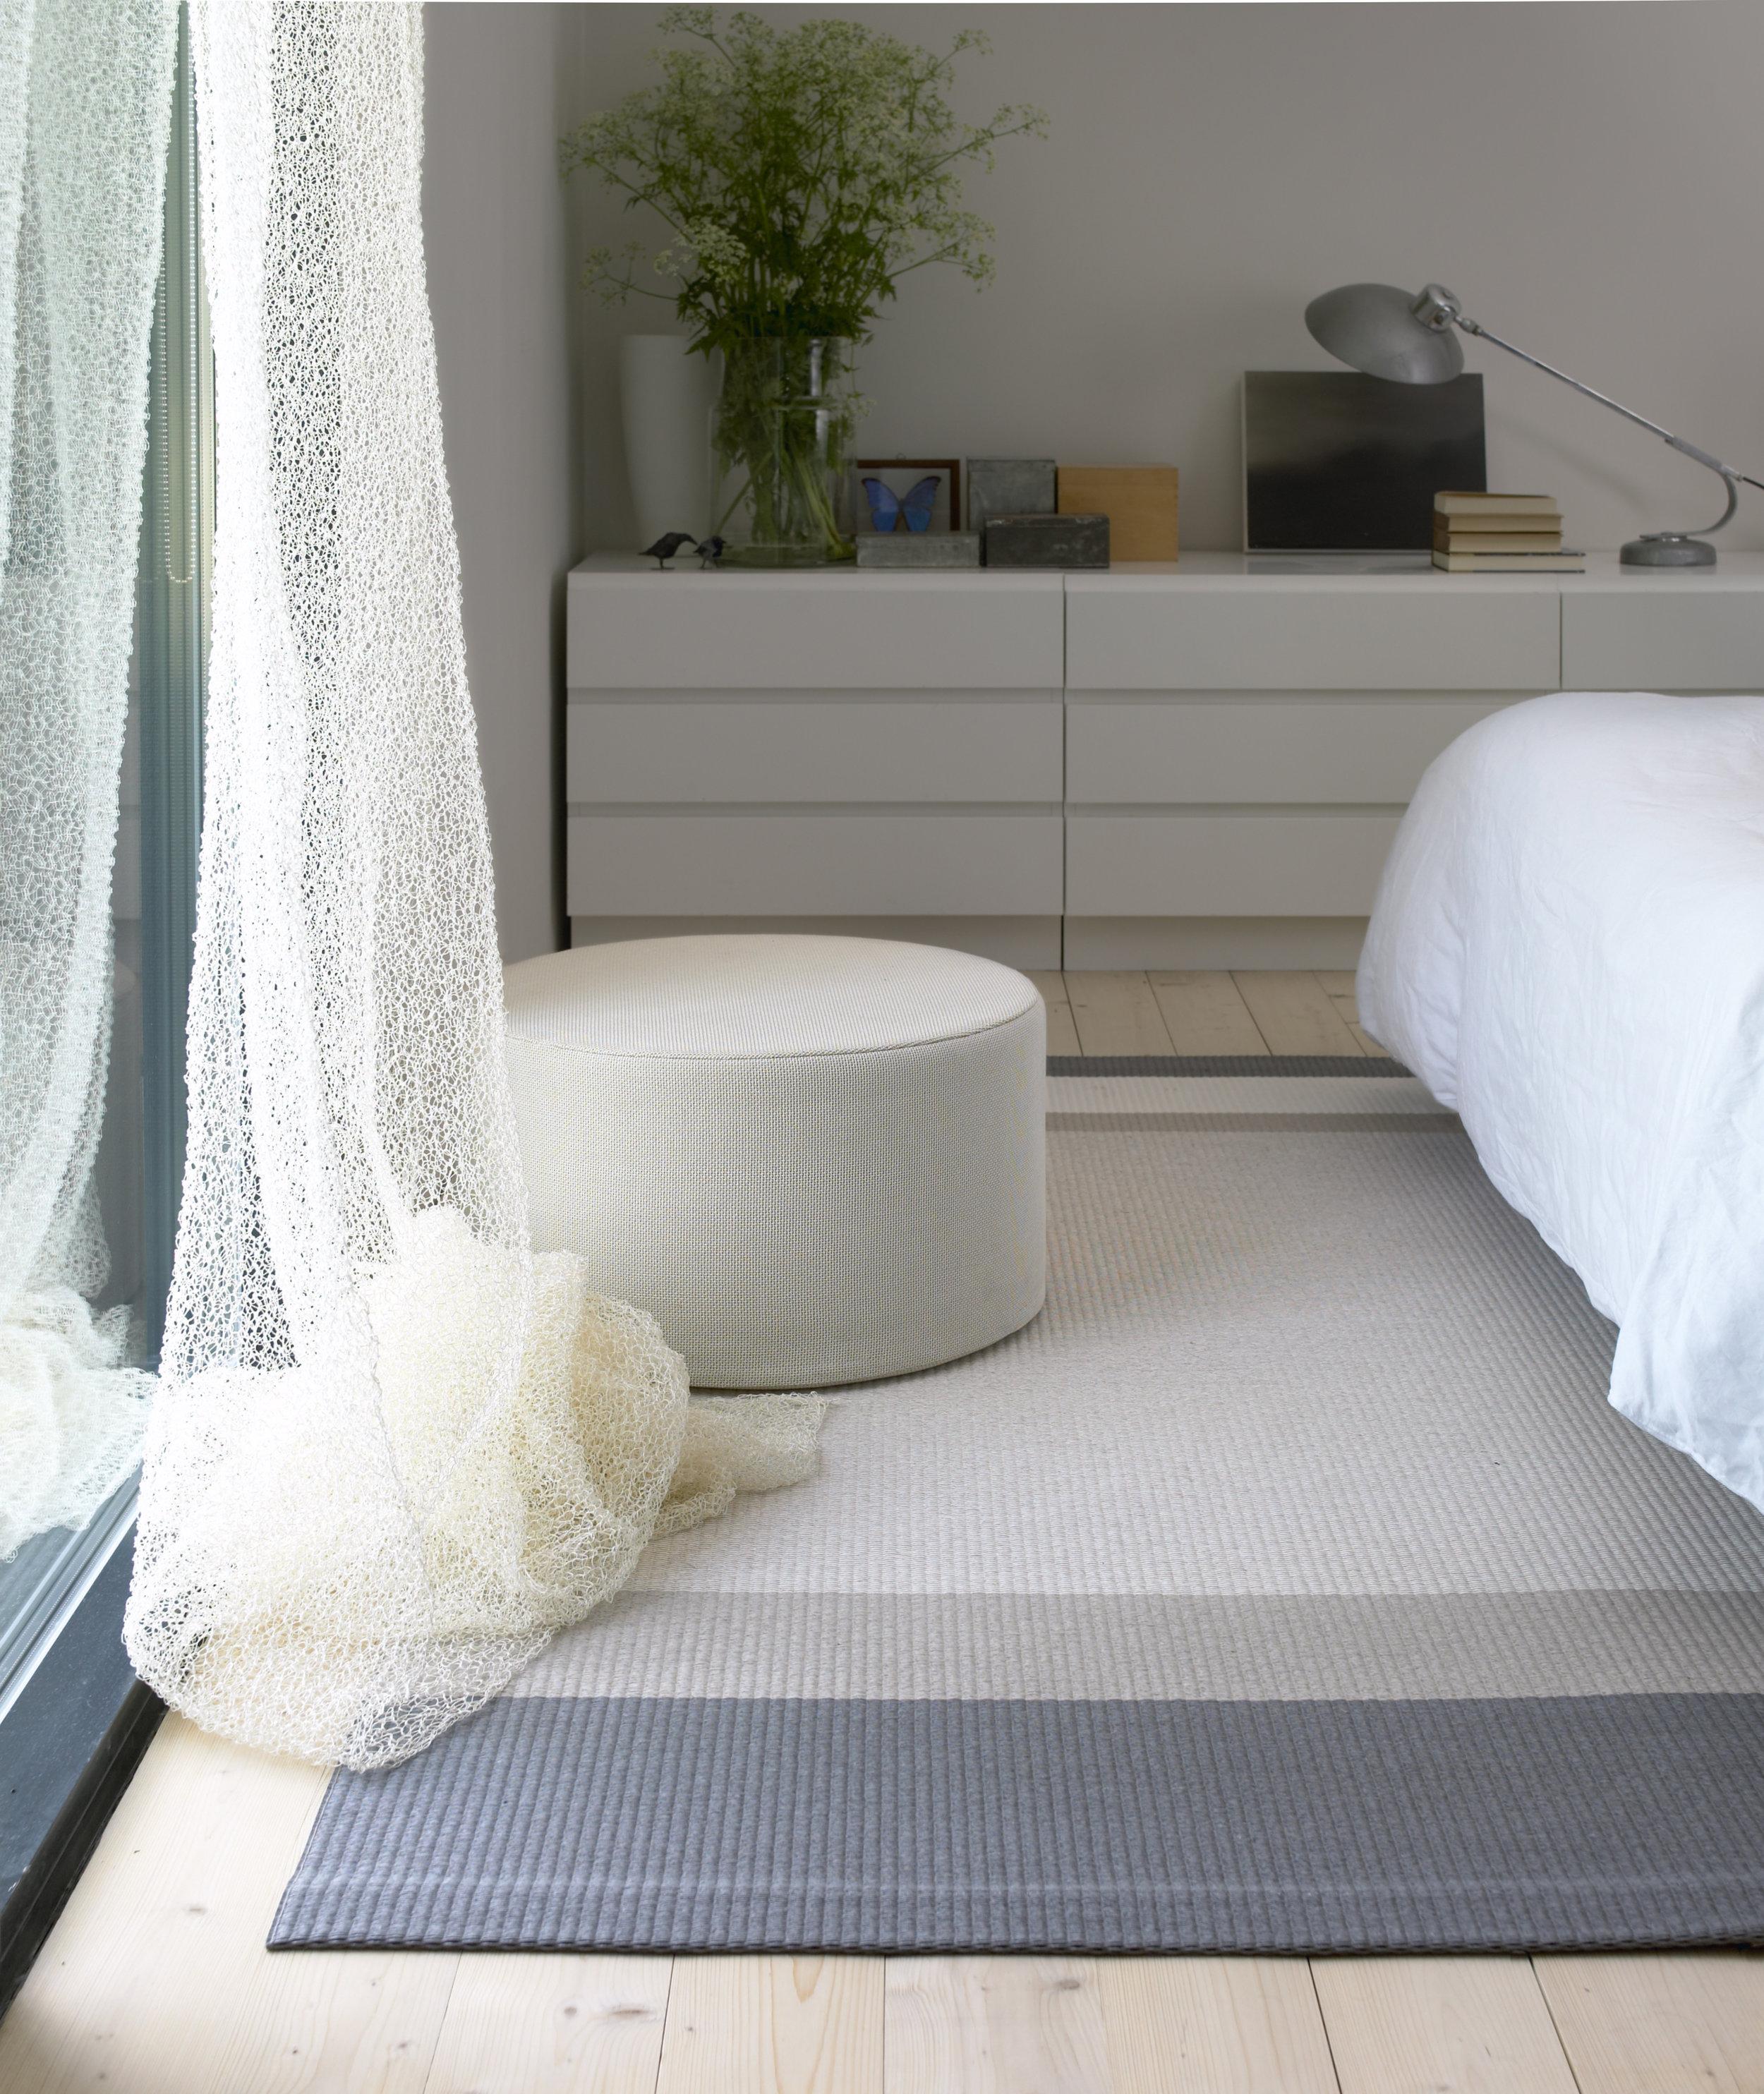 1331501  Panorama  stone-white paper yarn carpet, 7210101 Veil white curtain, 436 Round Cool cushion